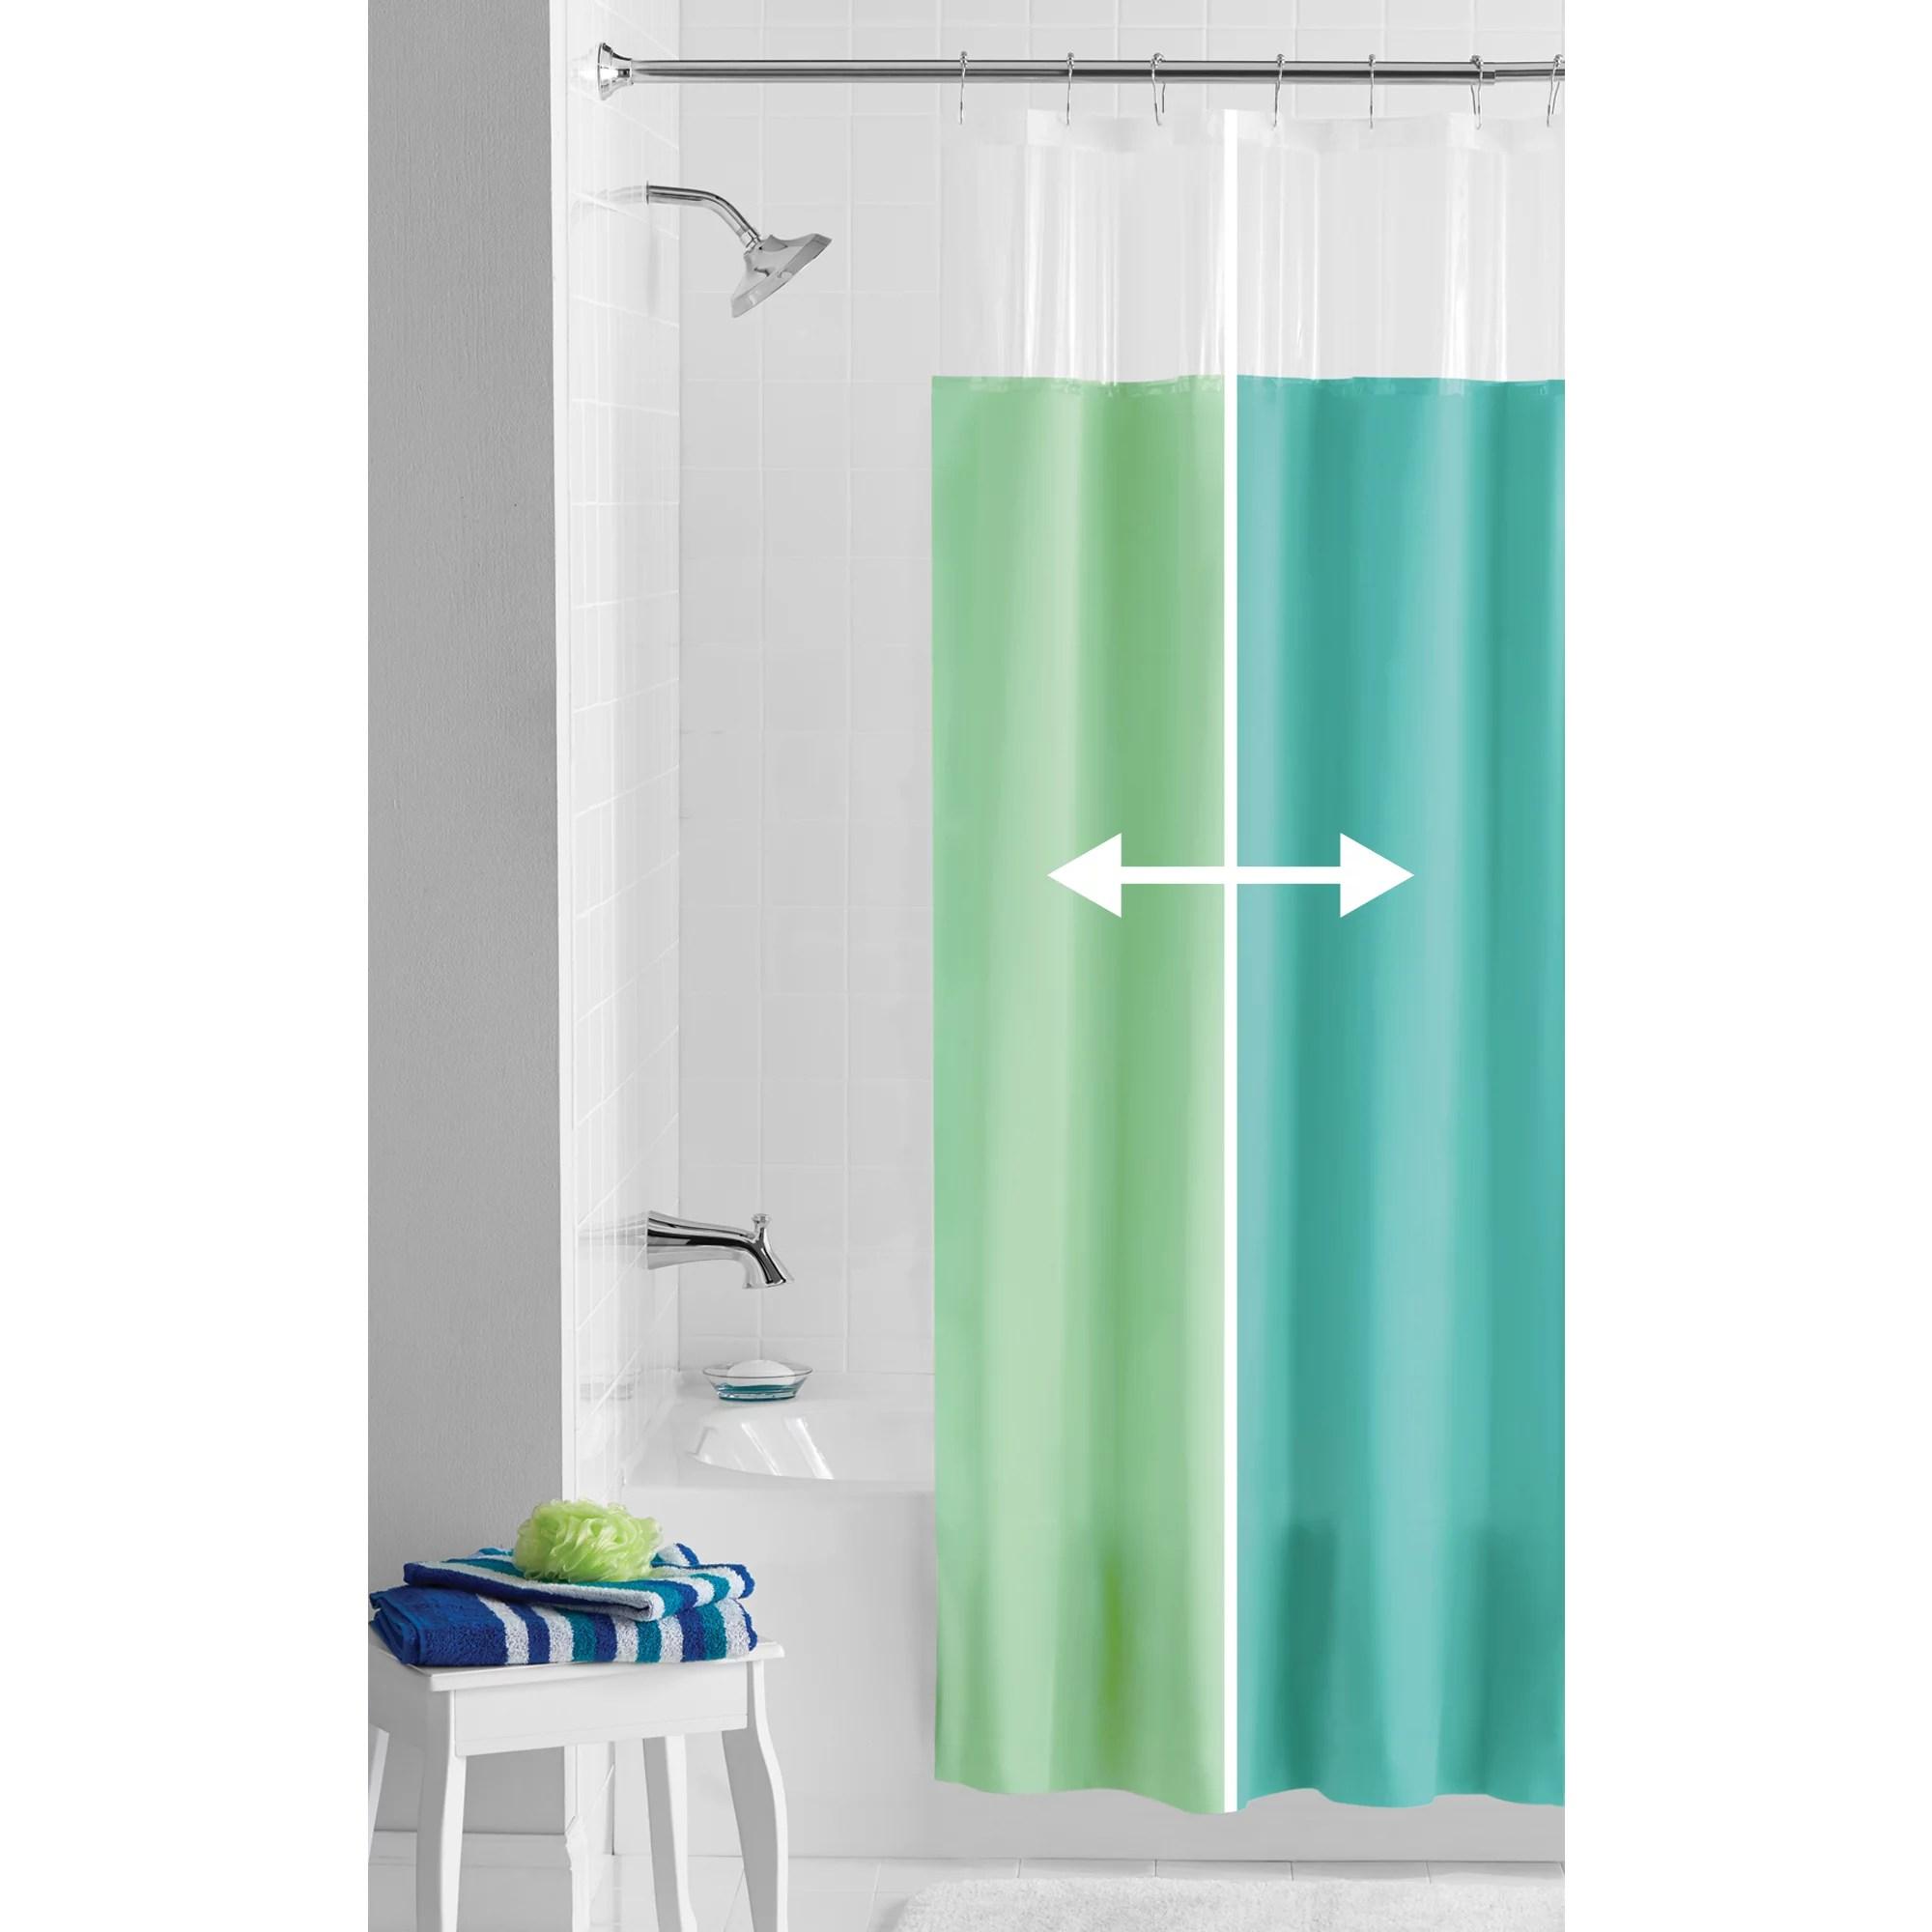 mainstays reversible blue green peva shower curtain or liner 70 x 72